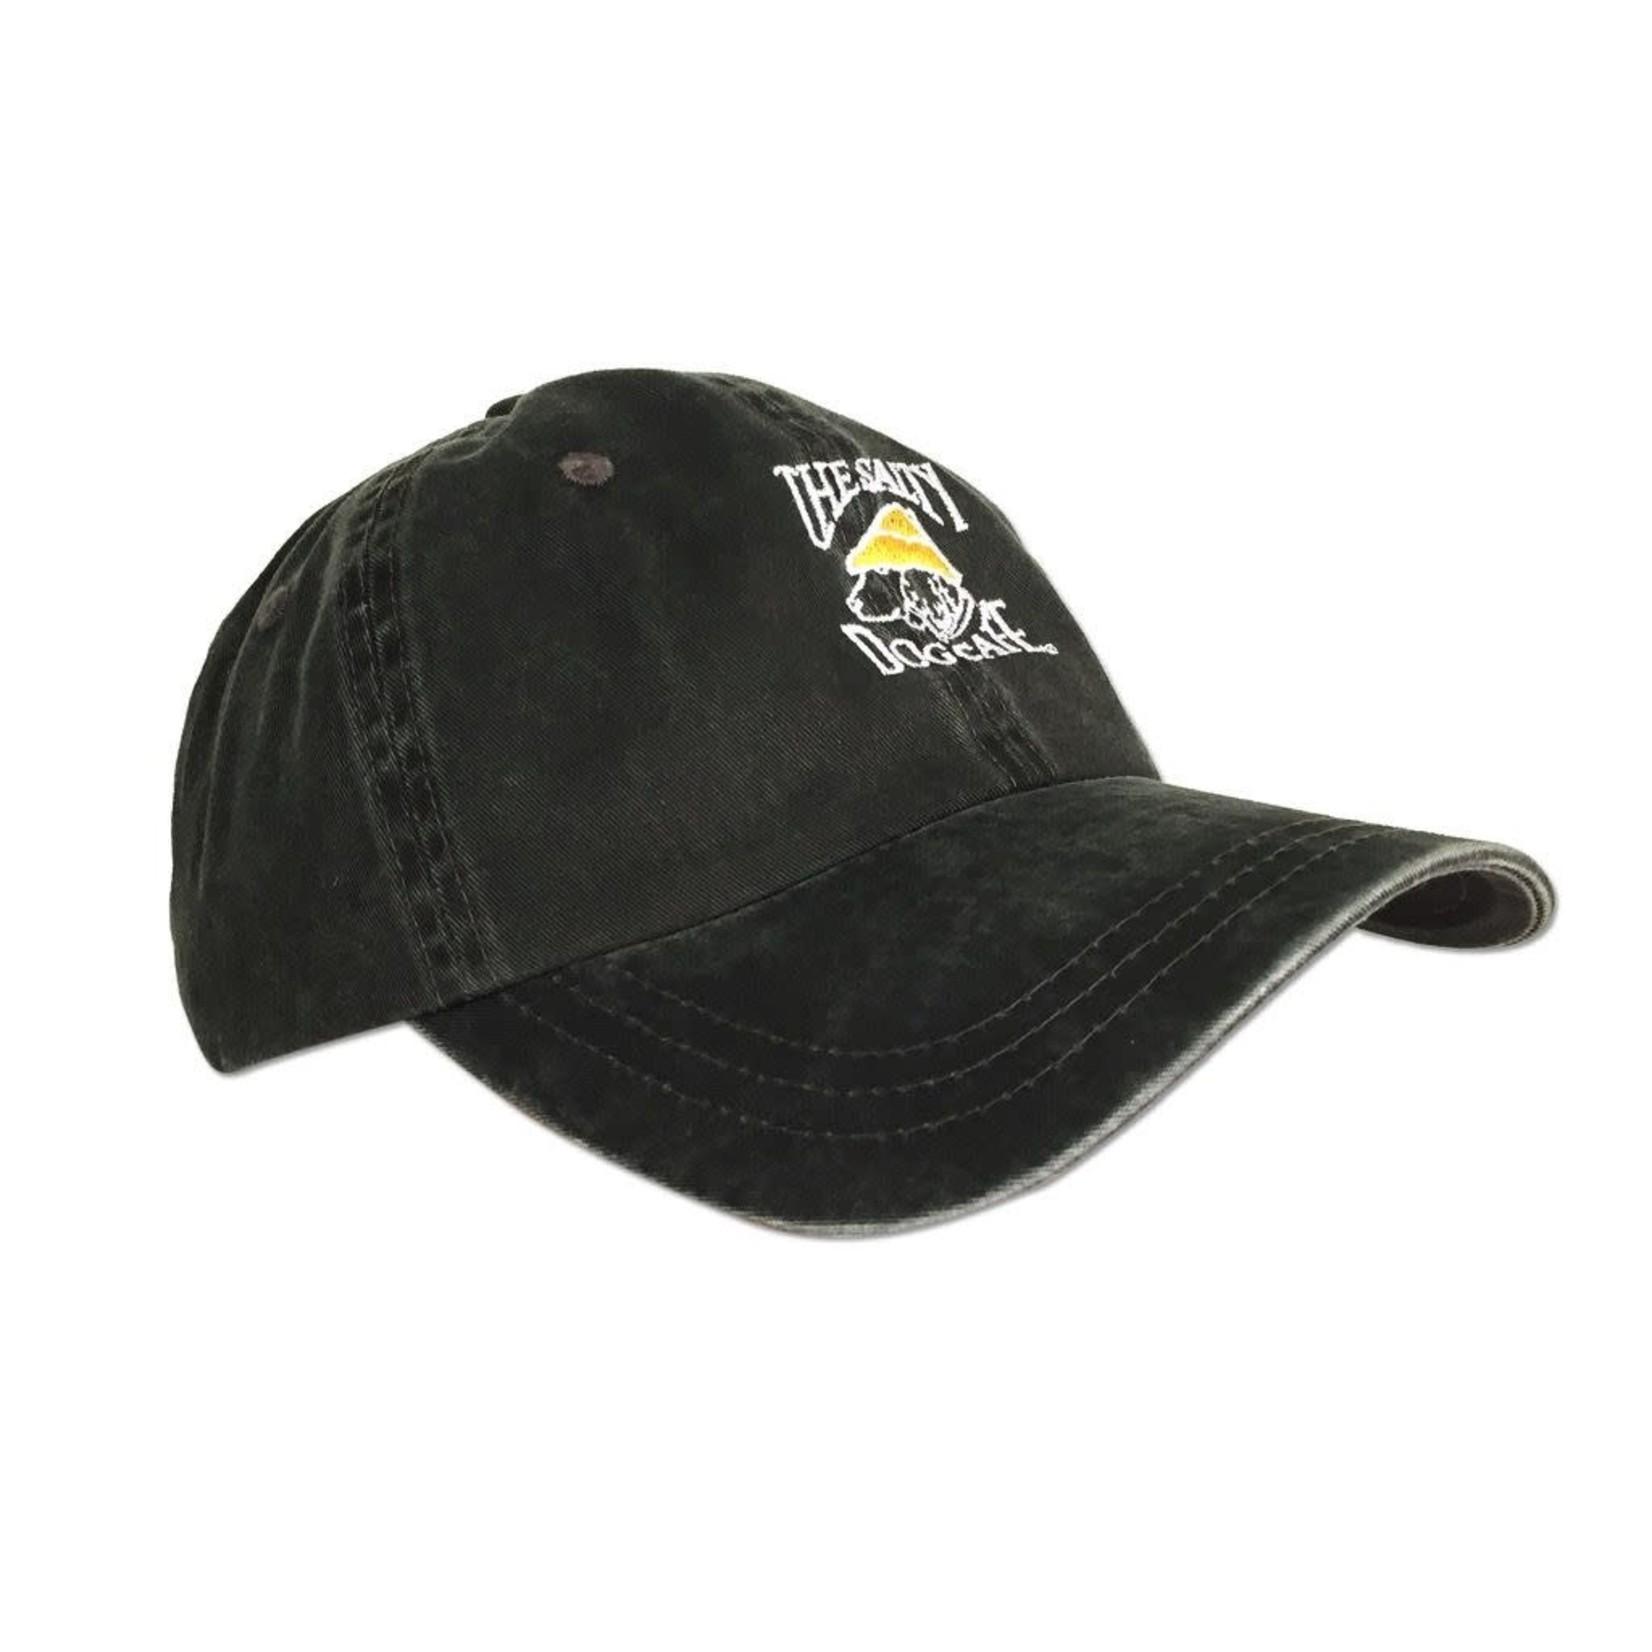 Hat - Pigment Dyed, Black